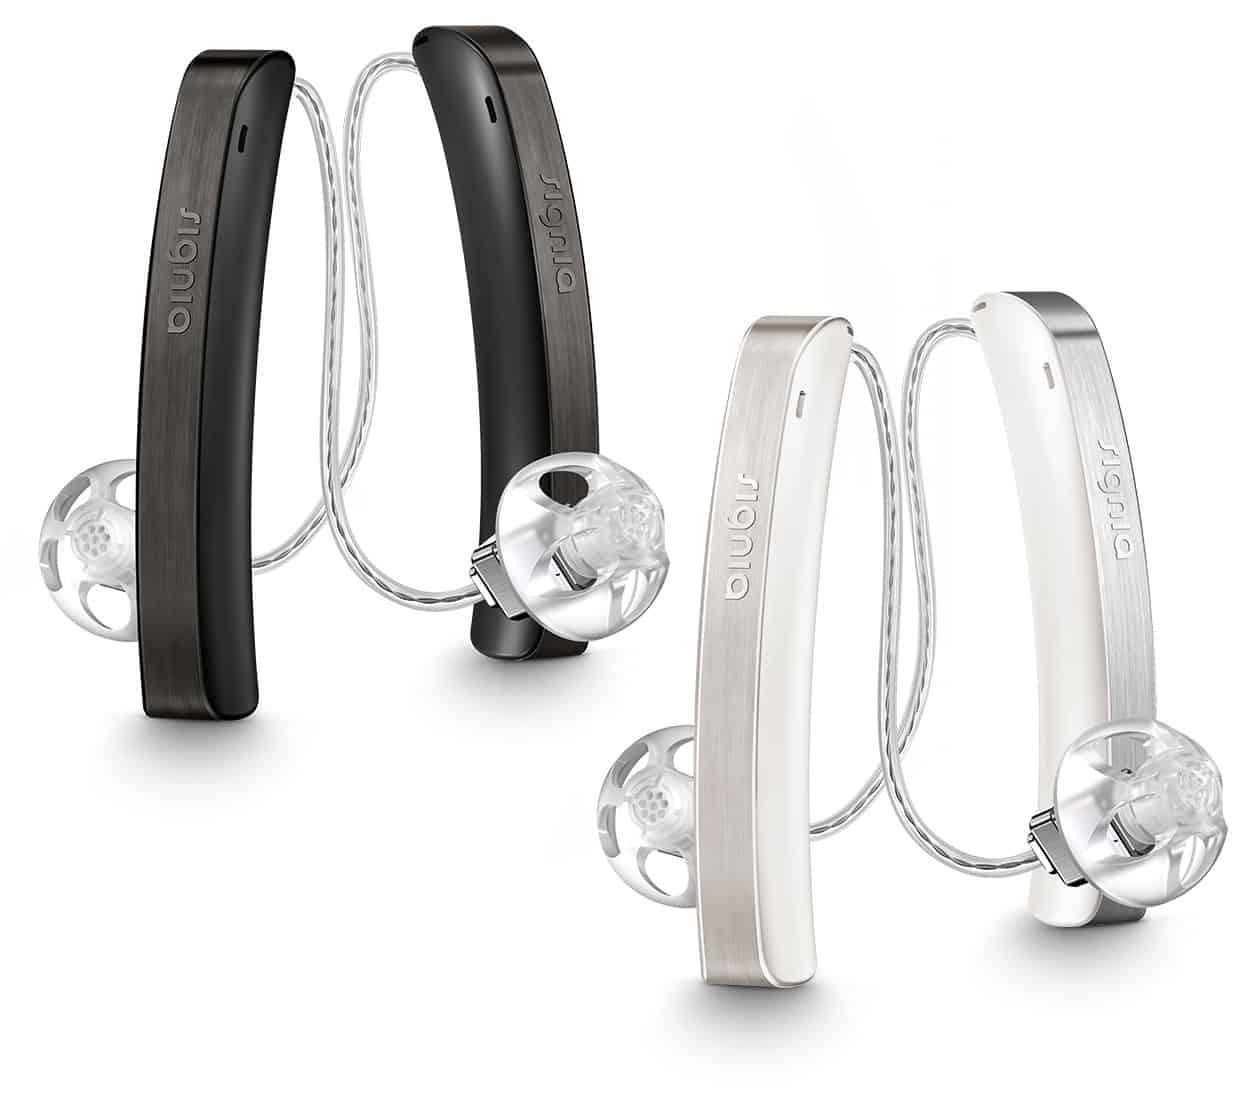 Styletto 2 1 white black pair 1248 - Hörgeräte - Produkte